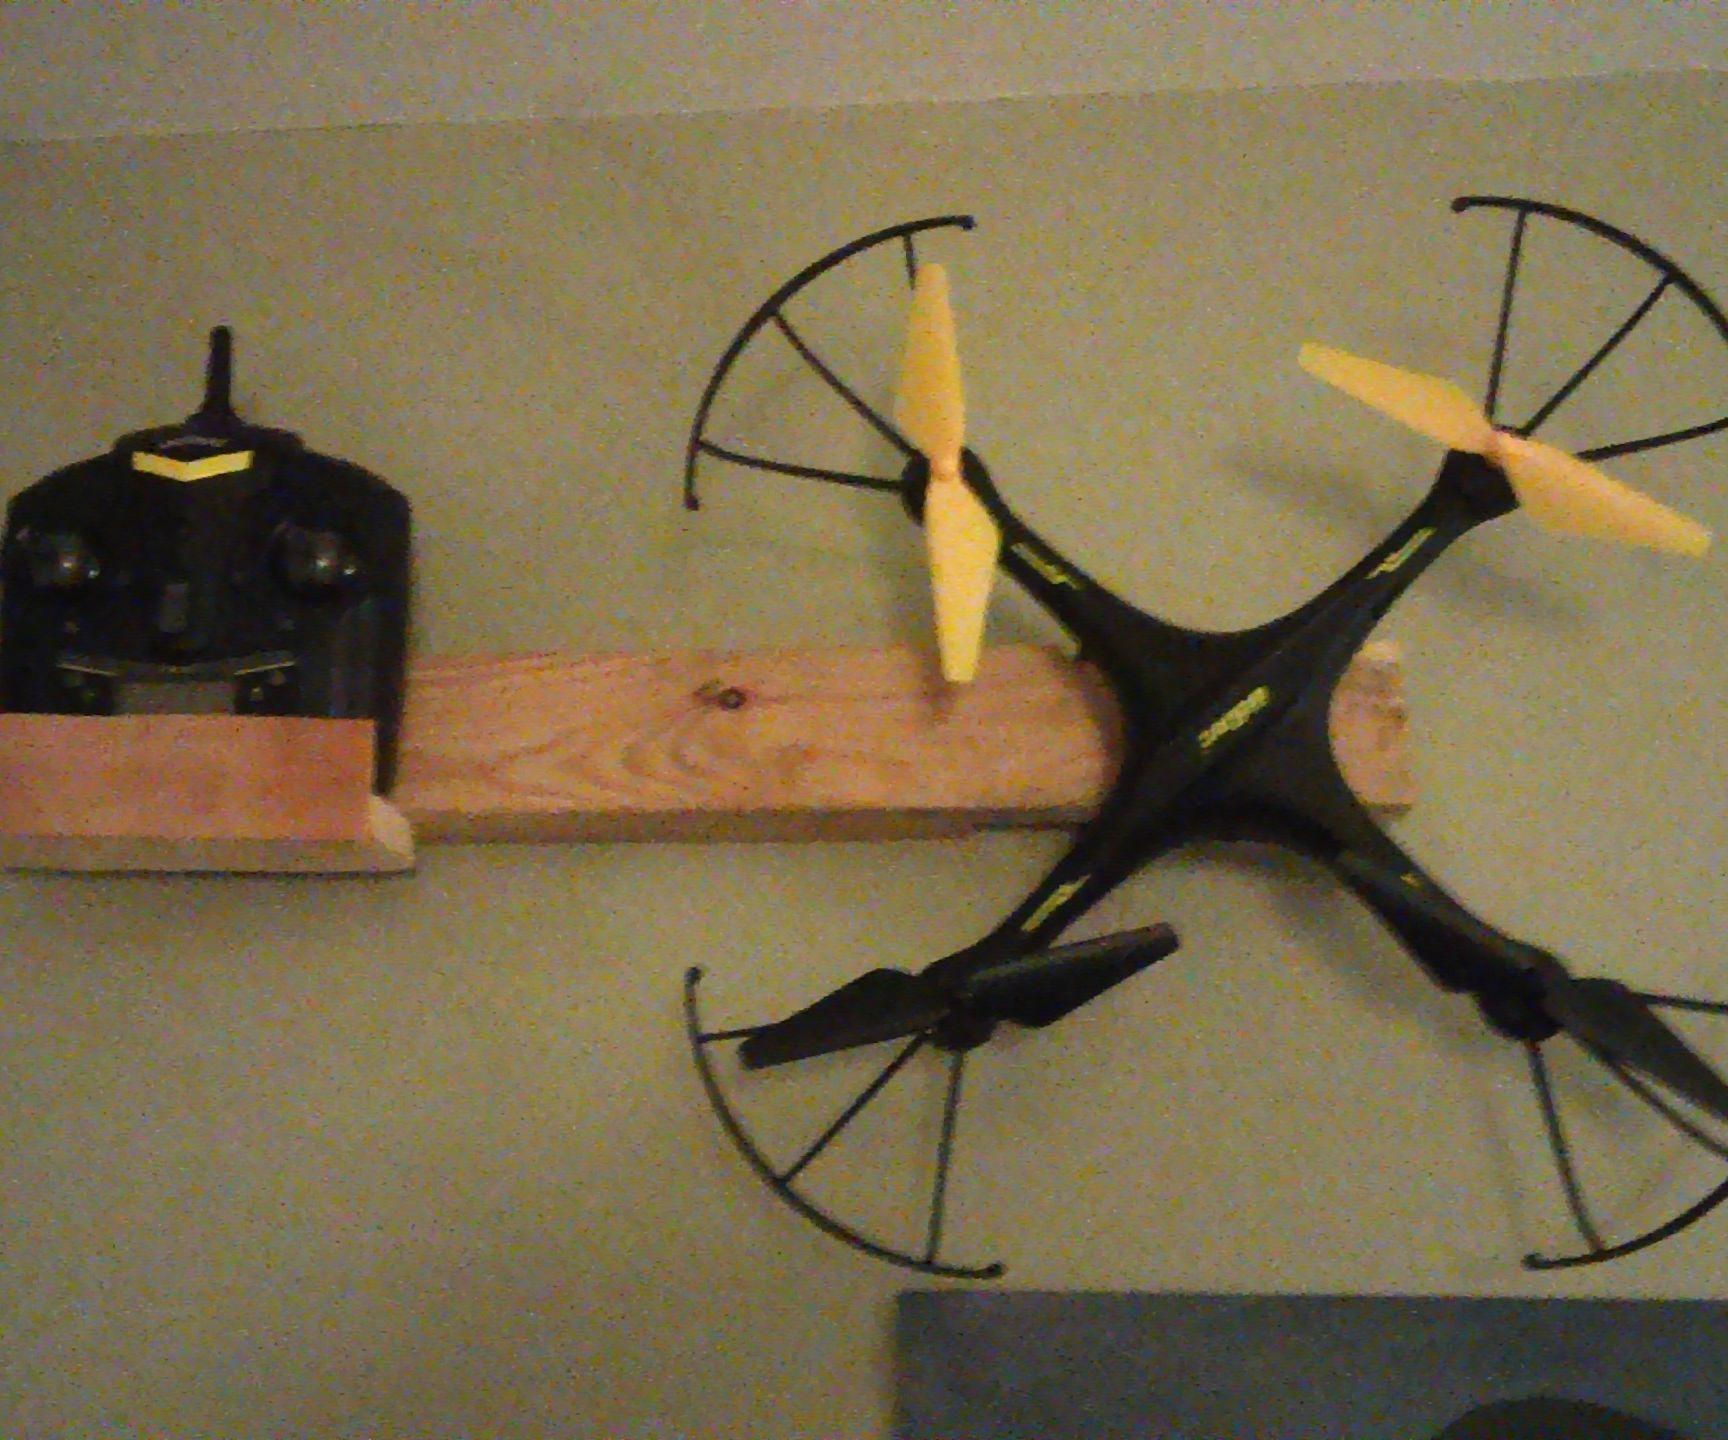 Drone Shelf version 1